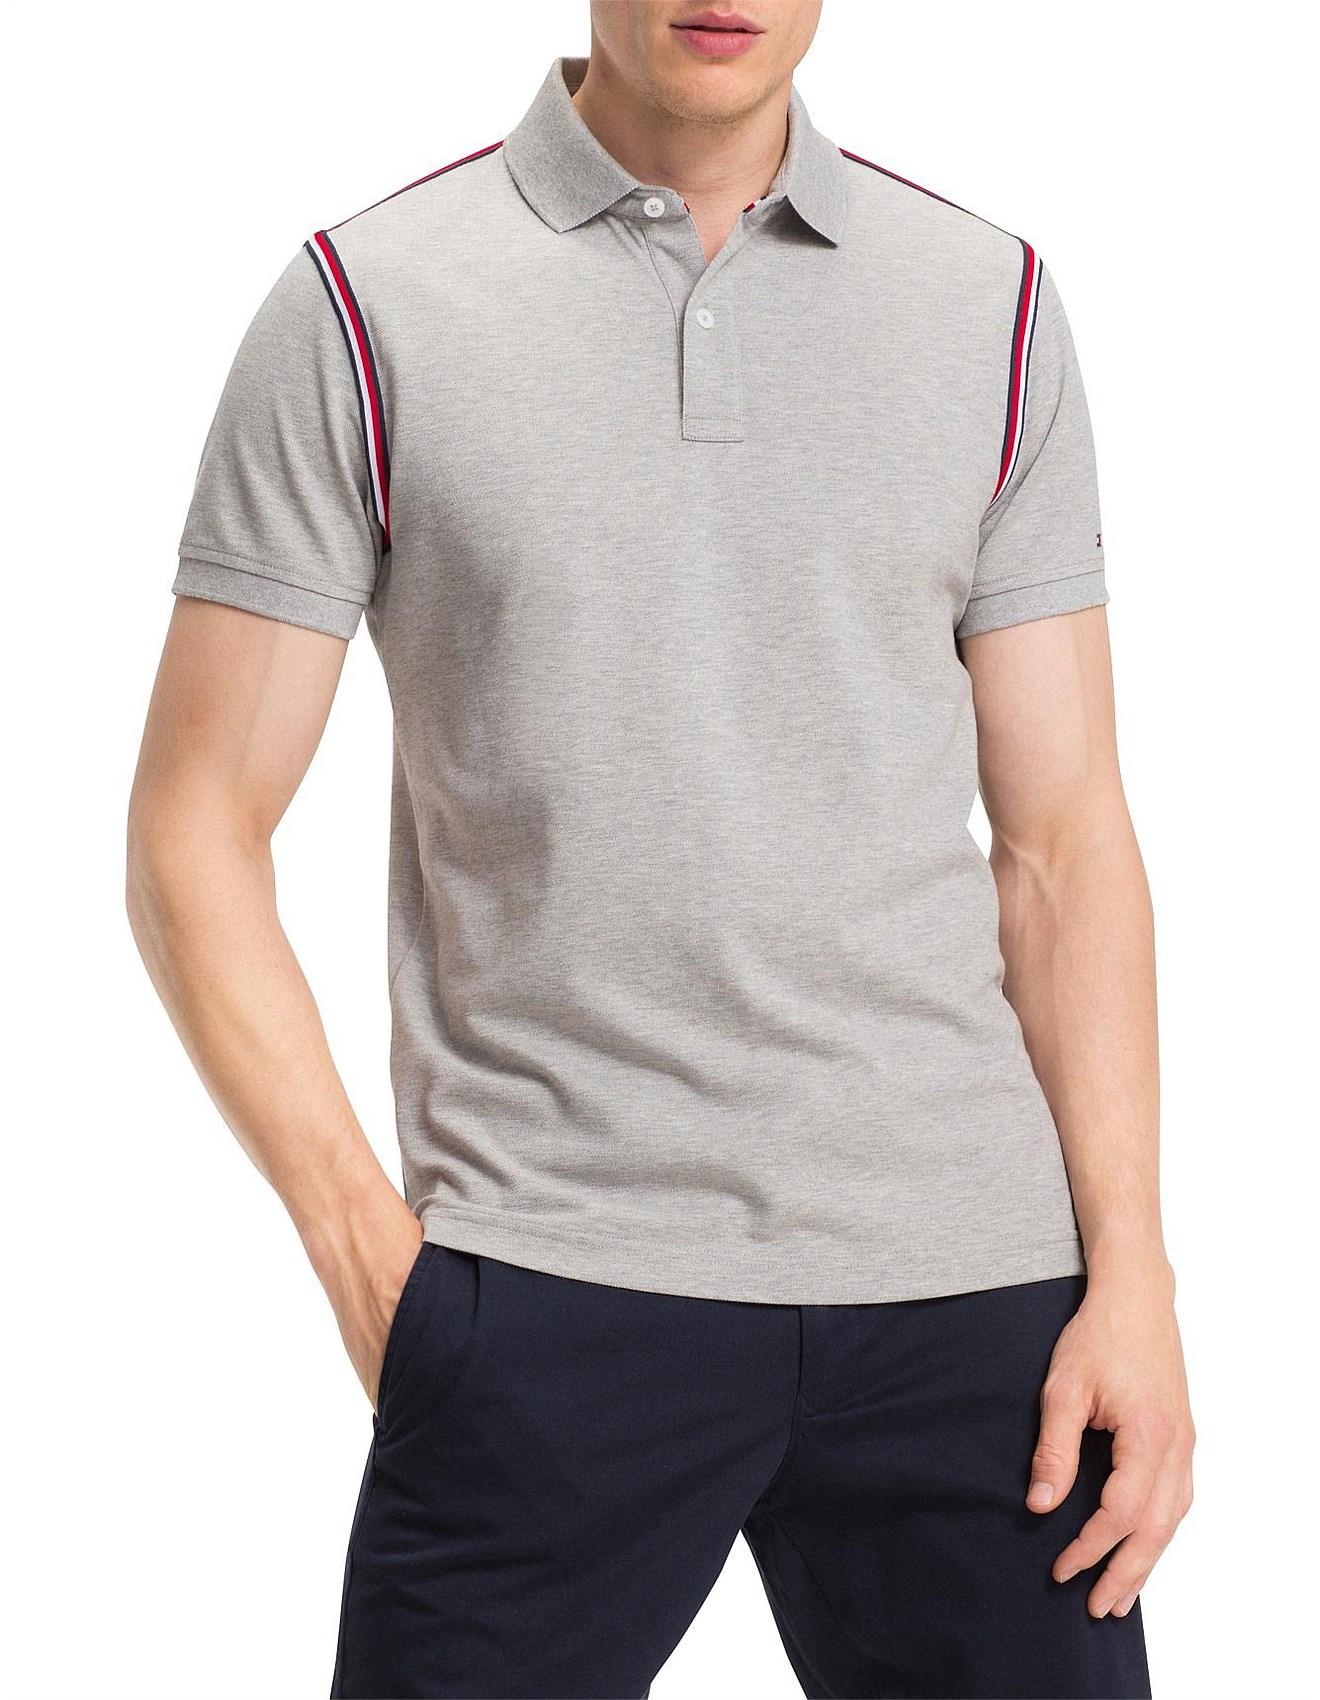 191680a7 Men's Polo Shirts | Buy Polo Shirts Online | David Jones - TOMMY TAPE SLIM  POLO